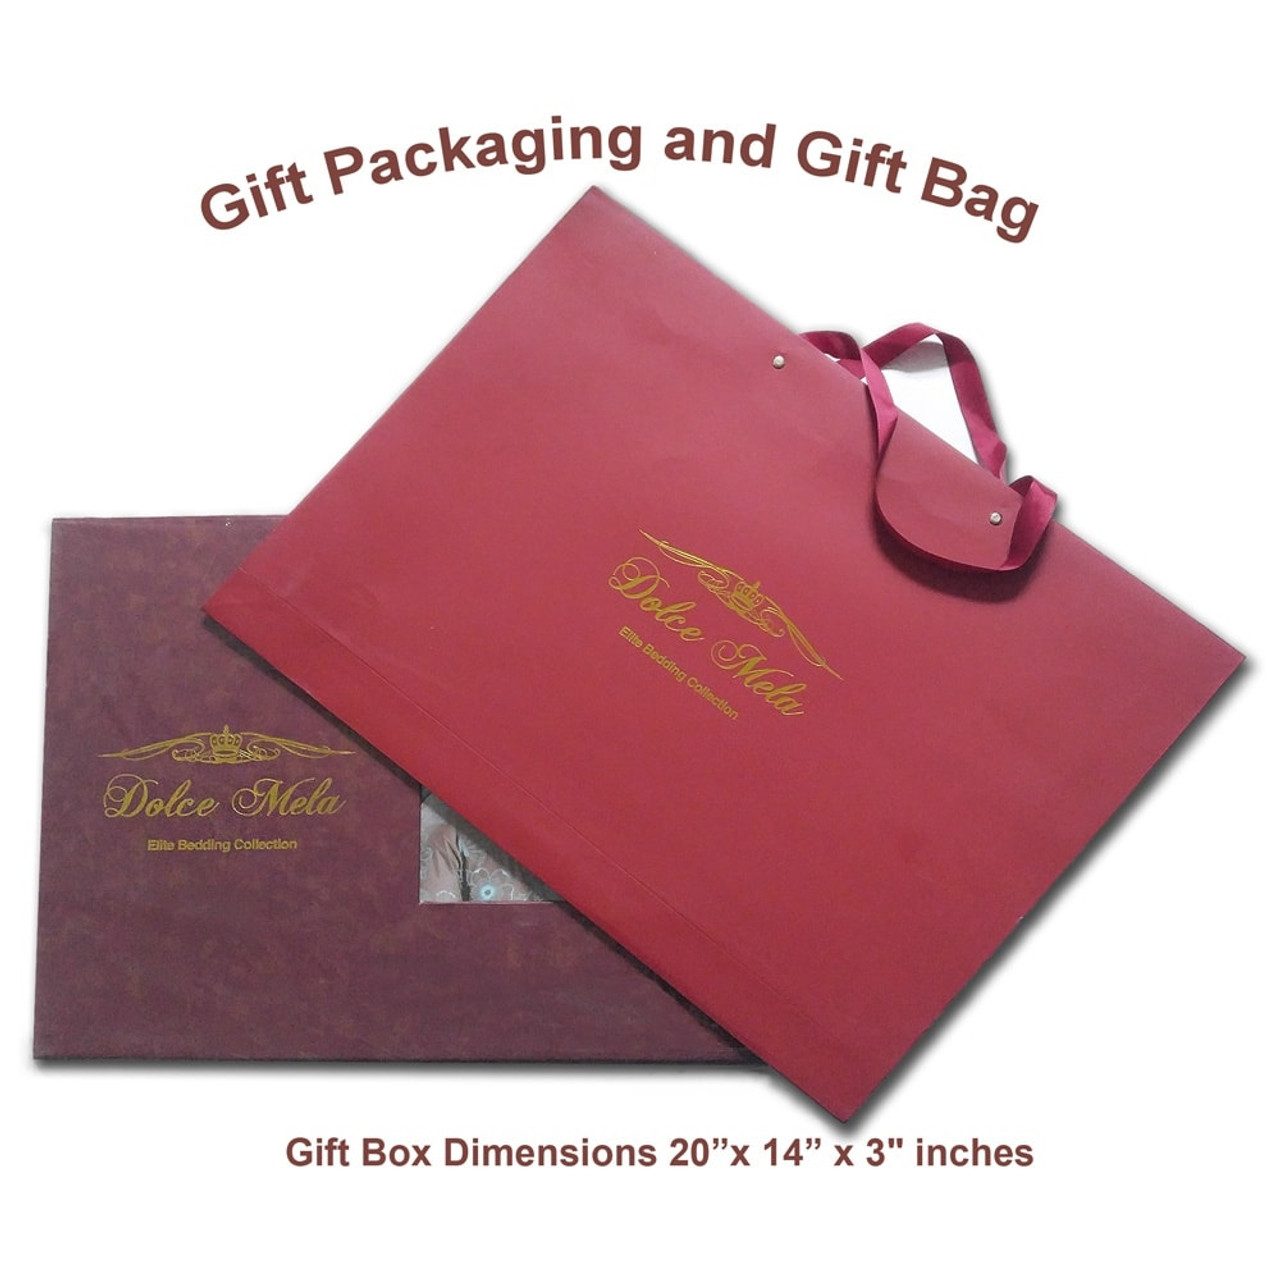 DM504K Dolce Mela Bedding - Ancona, Luxury Jacquard King size Duvet Cover Set